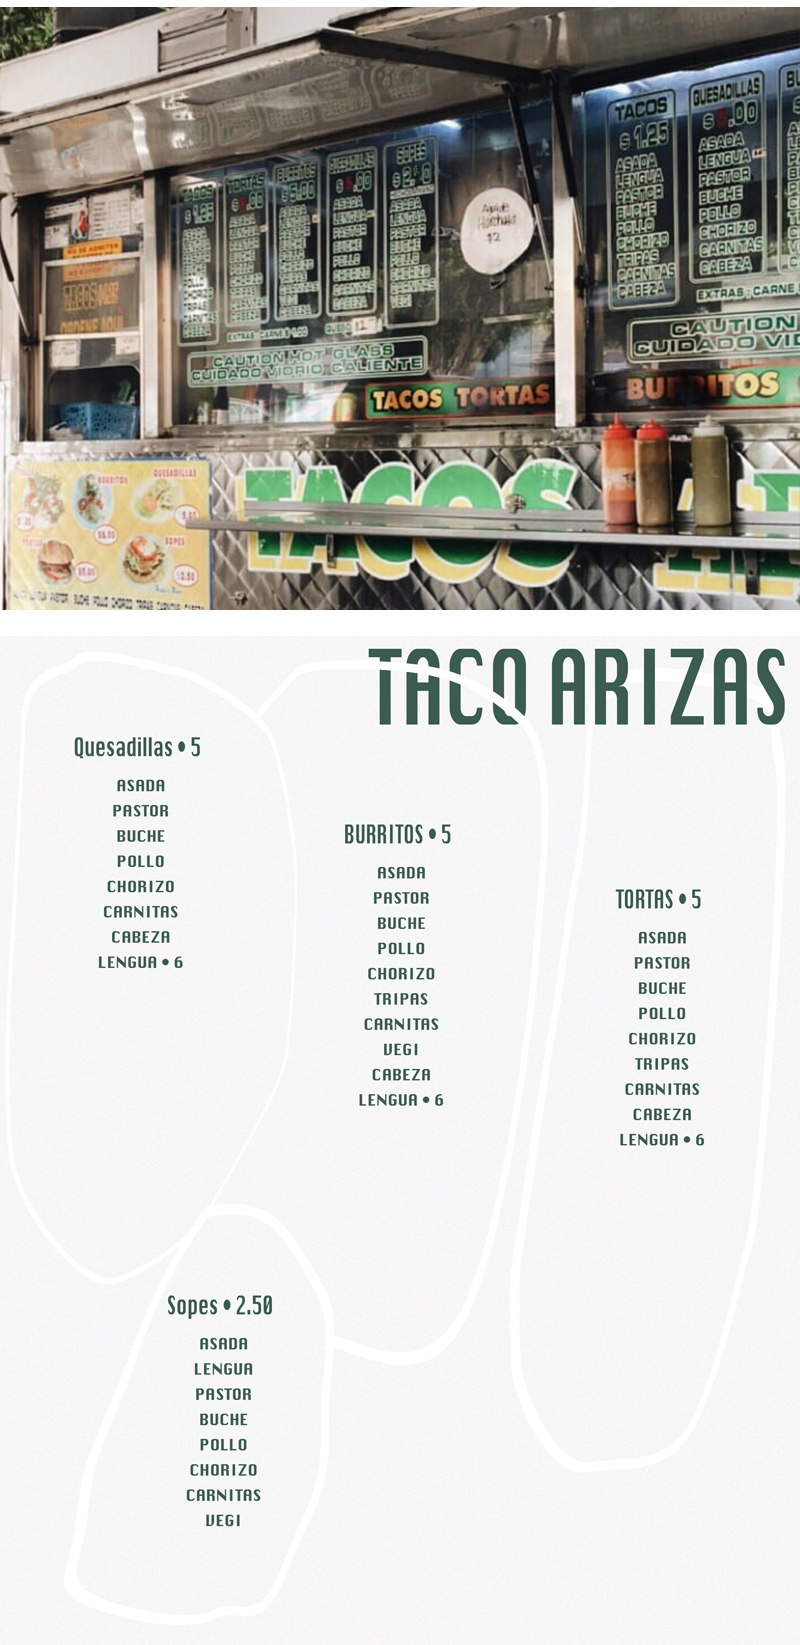 Tacos Arizas sqspace.jpg